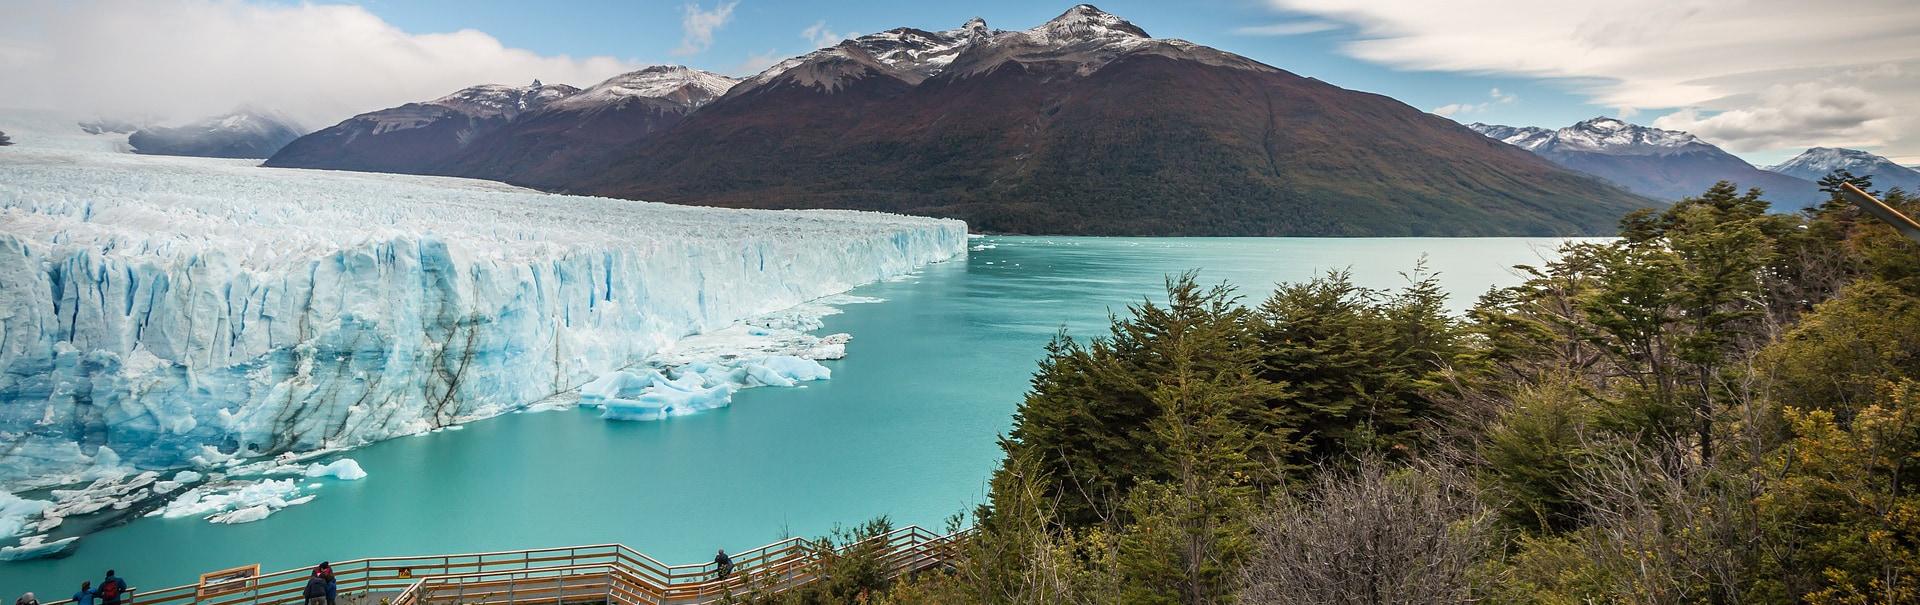 Argentina - Patagonia Explorer (AMAR) Banner